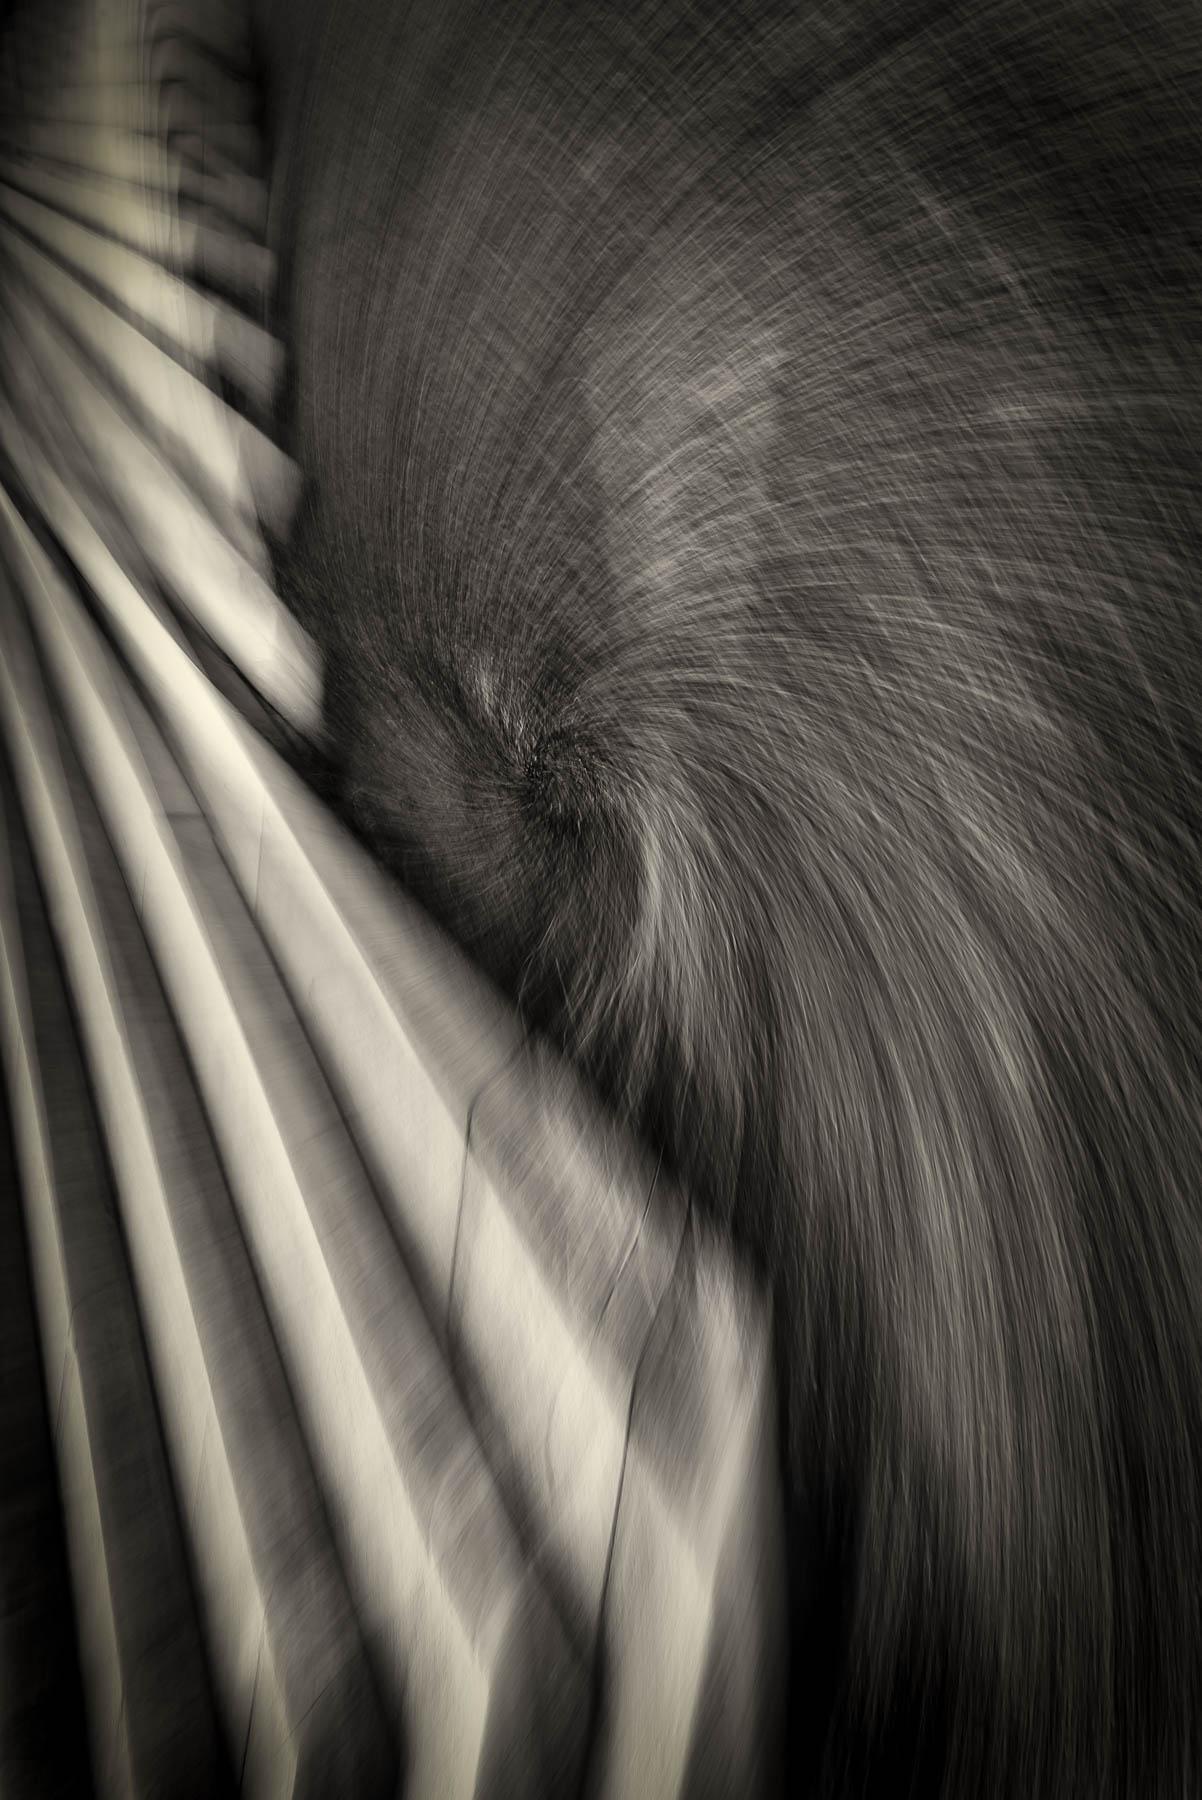 DUTCH_Bagley_Line Waves_Line Up 25_3.jpg